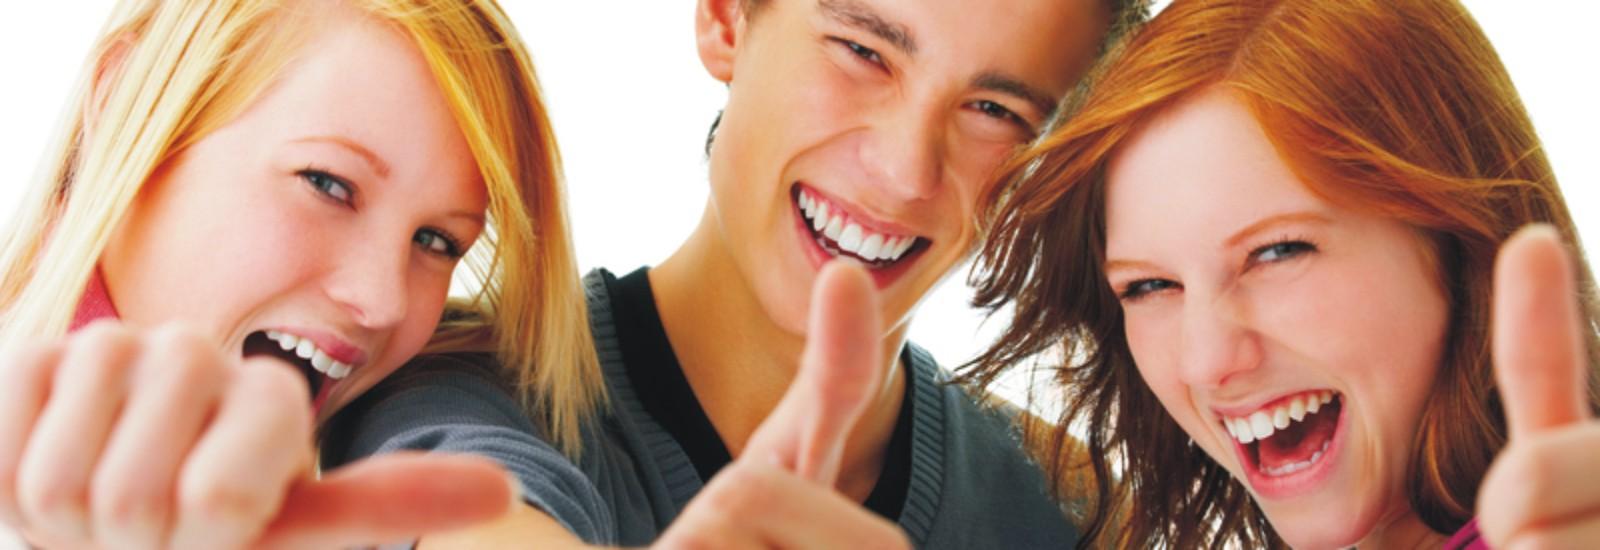 Girokonto junge Kunden